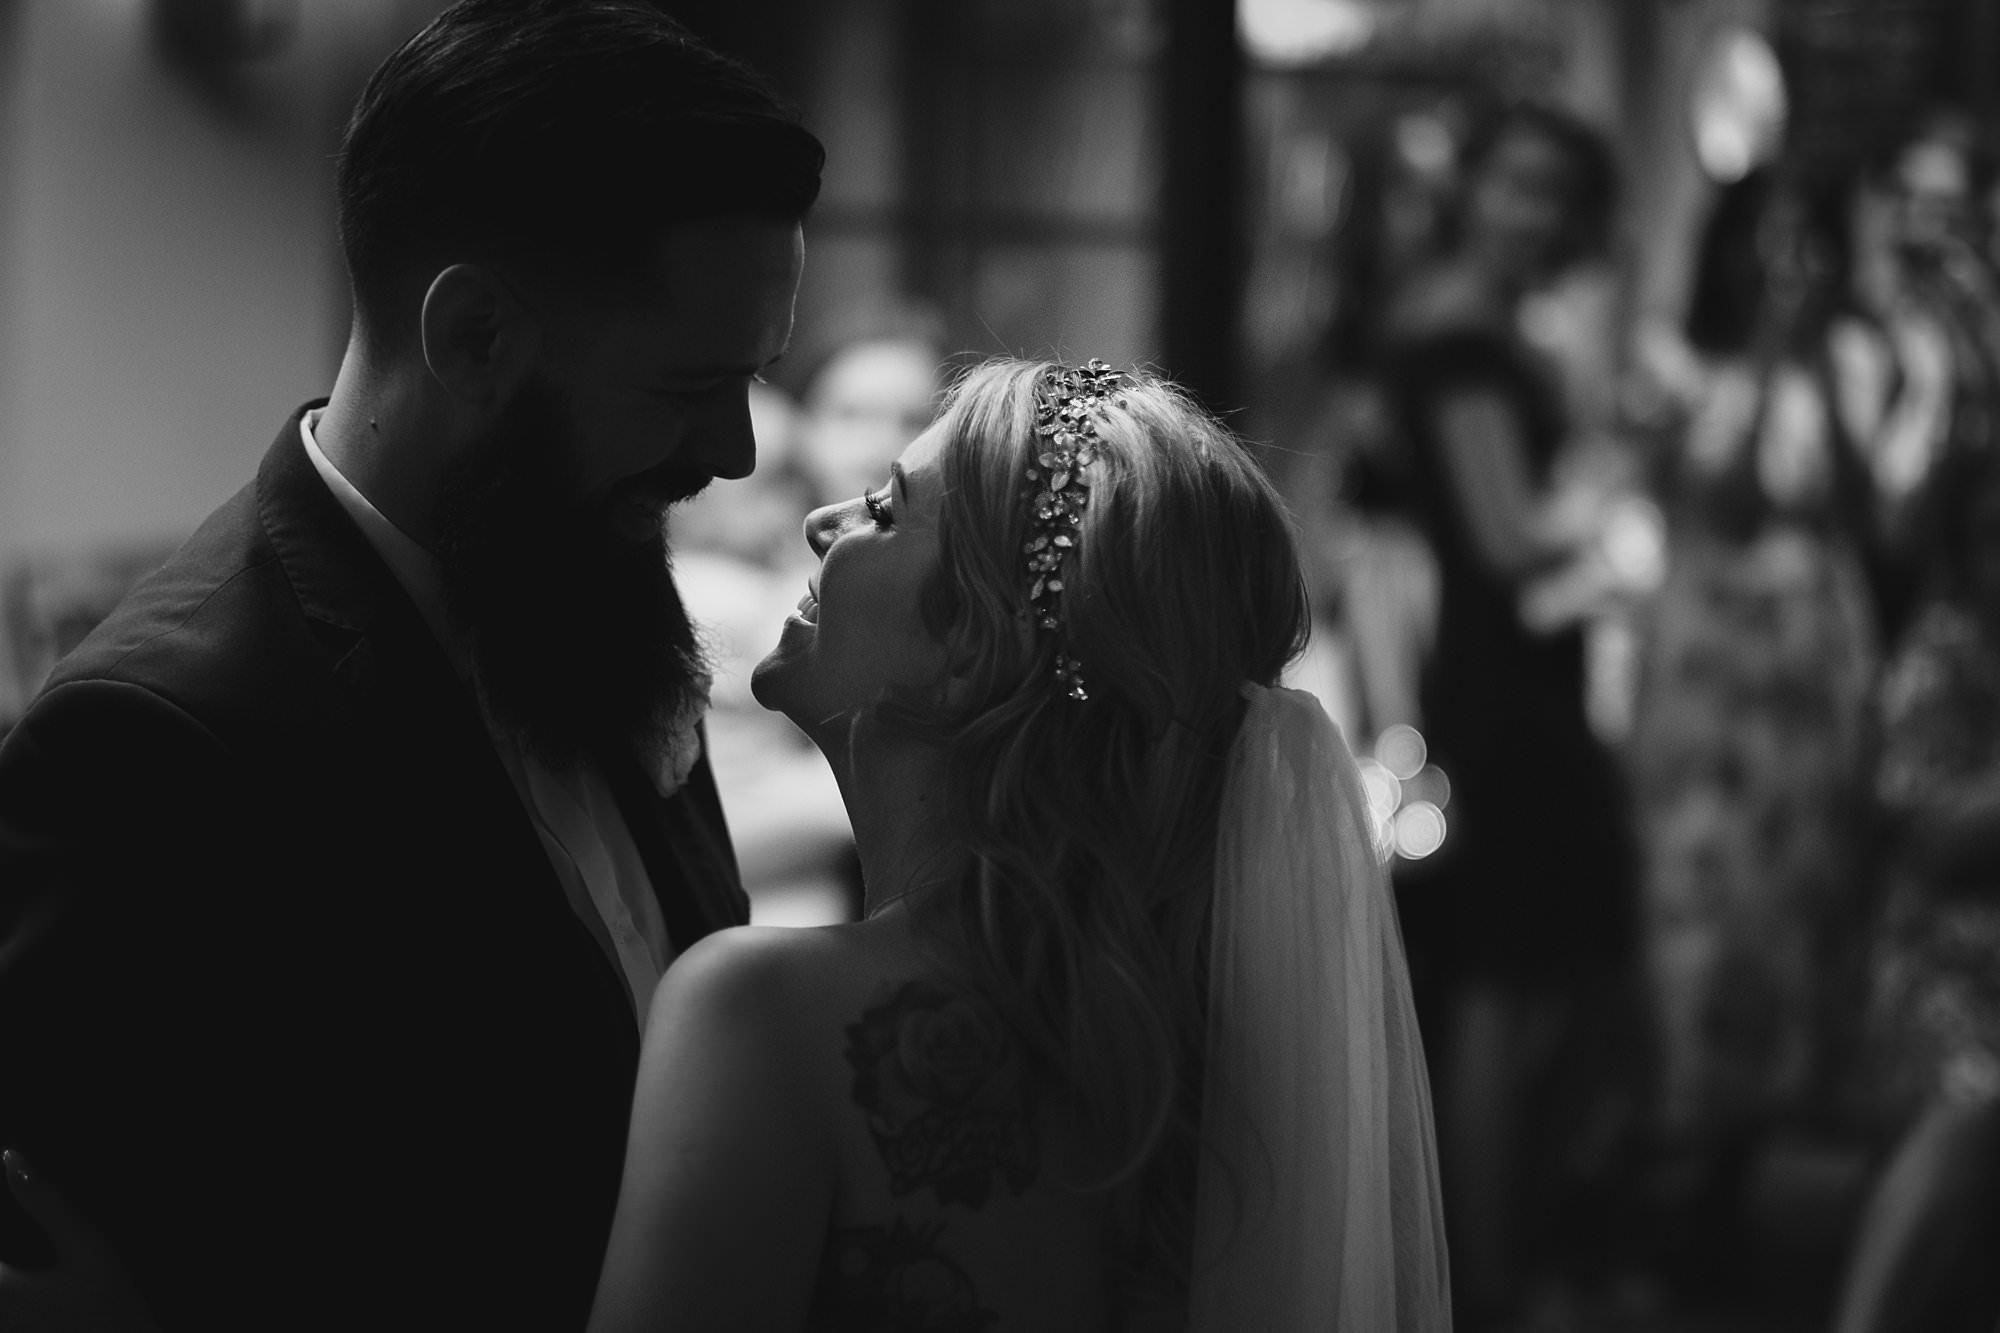 london pub wedding photographer jn 062 - The County Arms Wedding Photographer   Jen & Nick